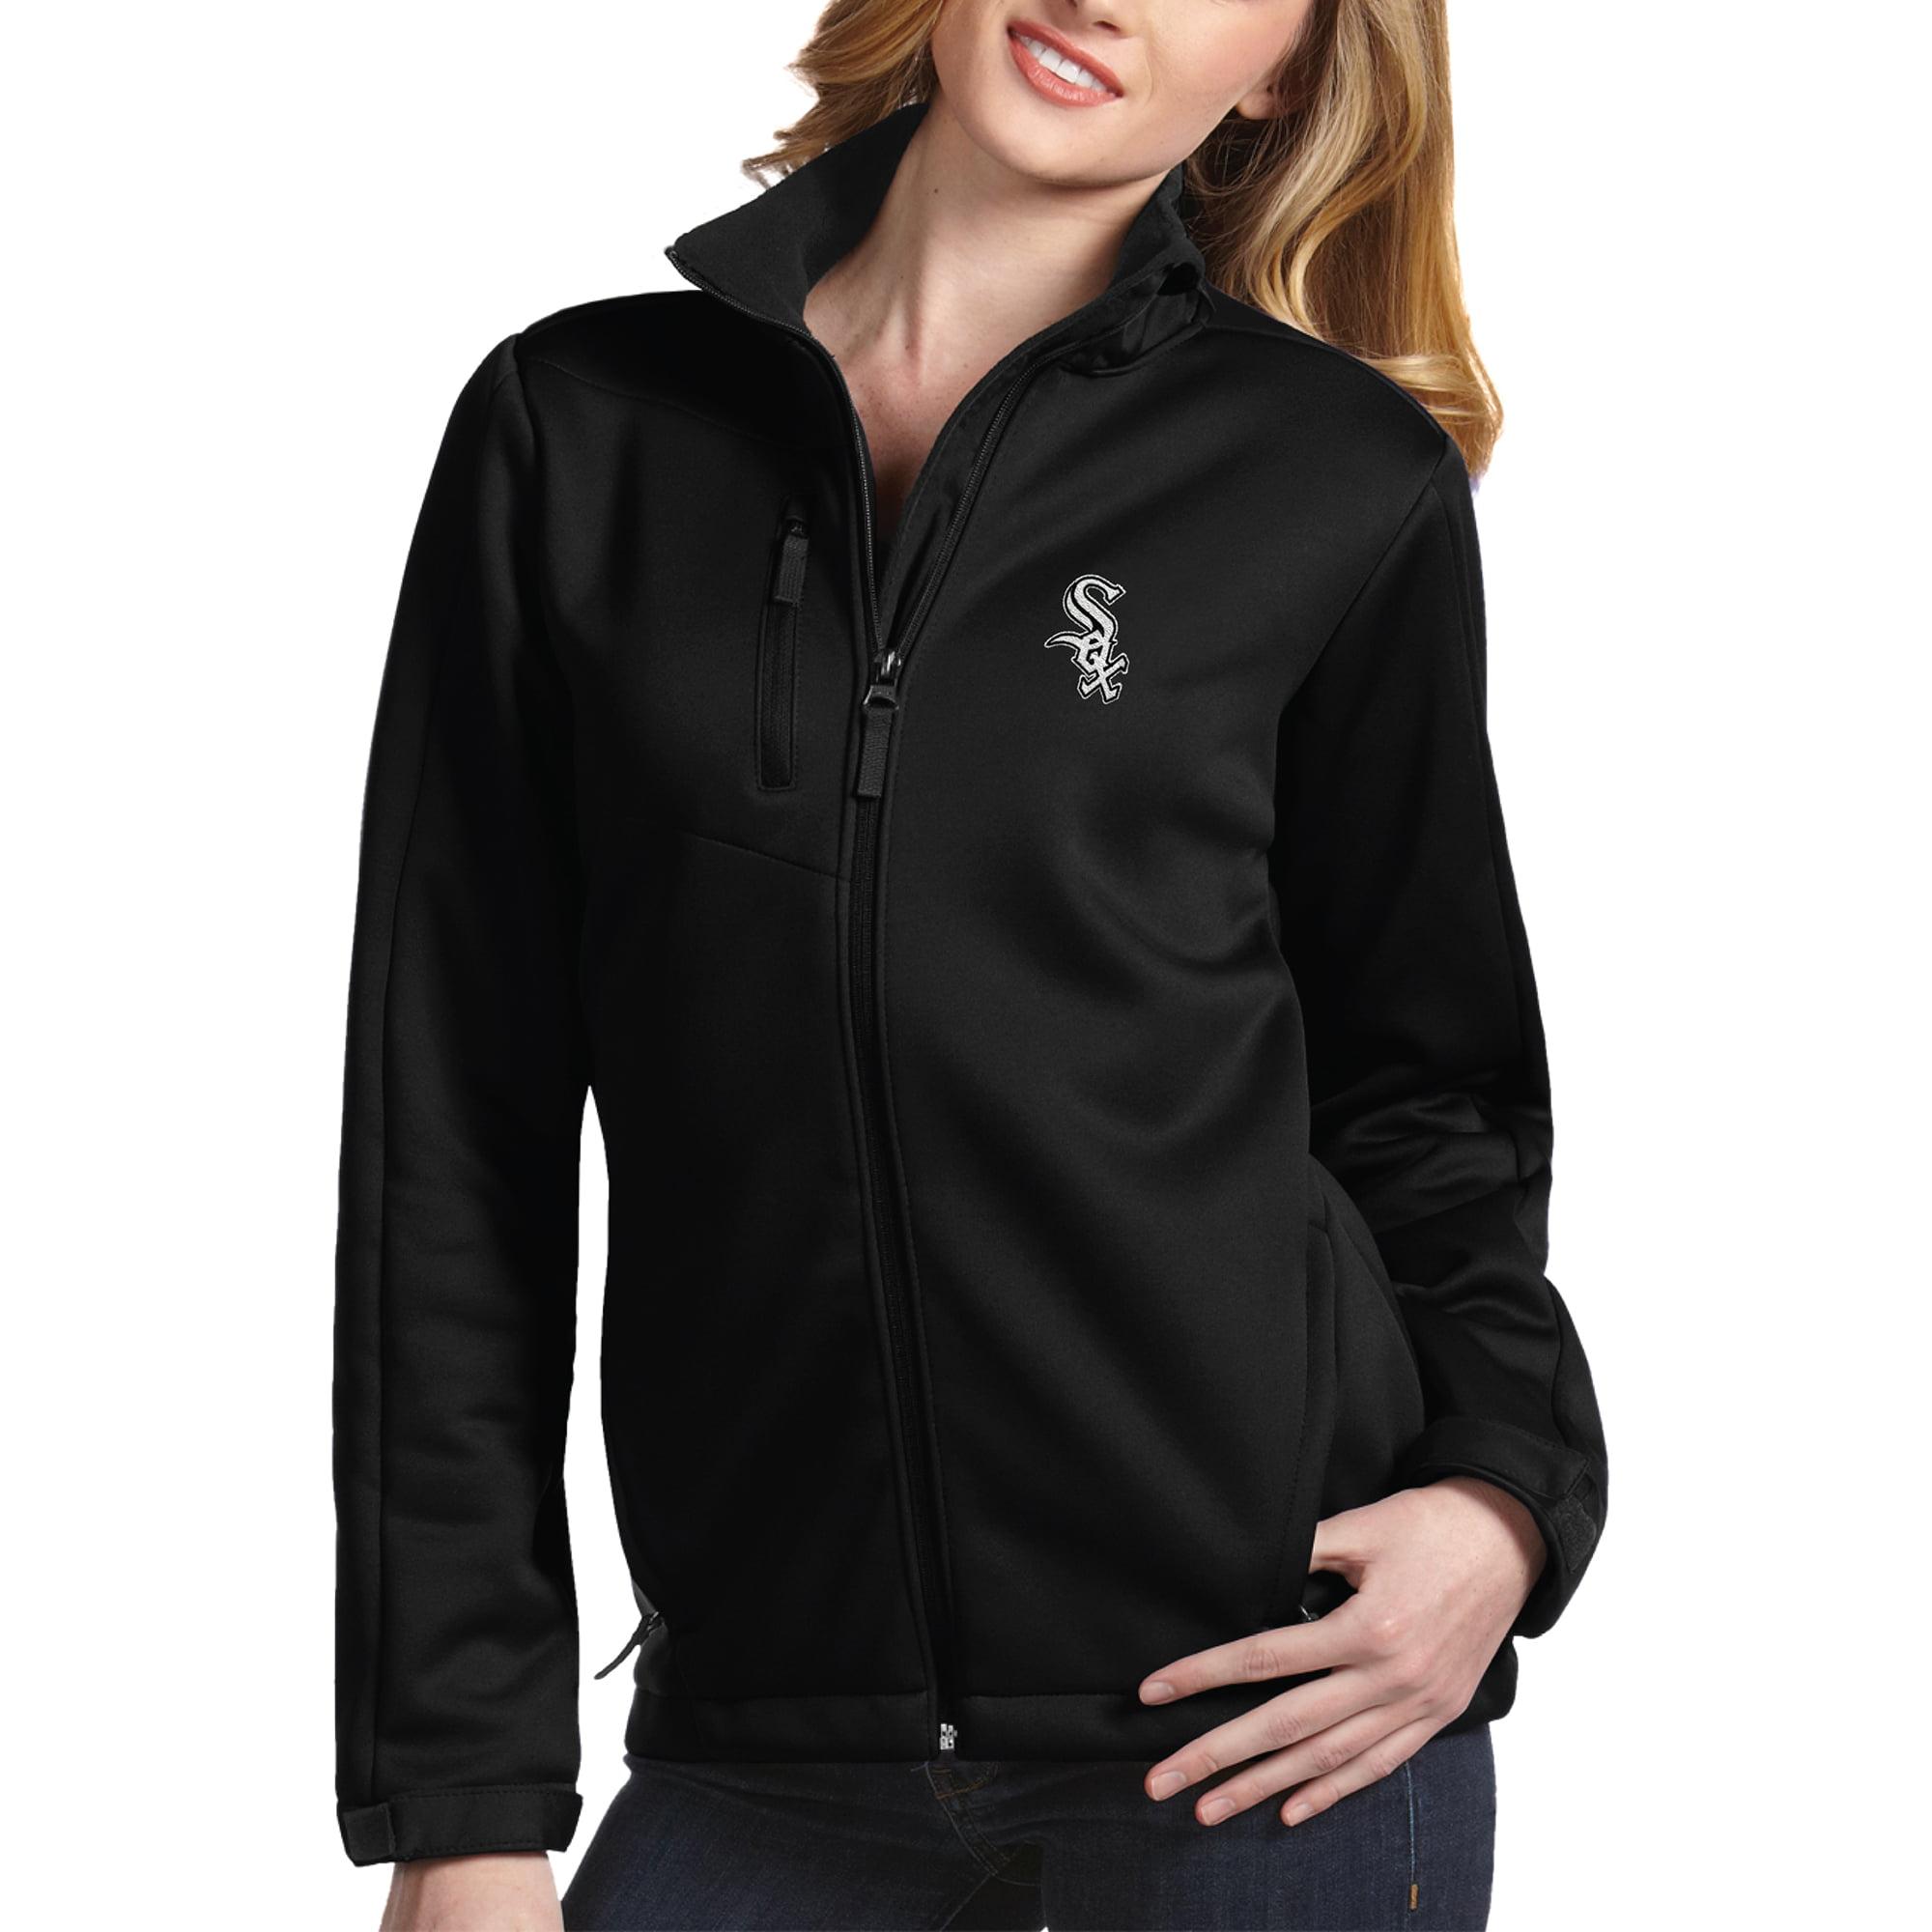 Chicago White Sox Antigua Women's Traverse Jacket Black by ANTIGUA GROUP/ 22534